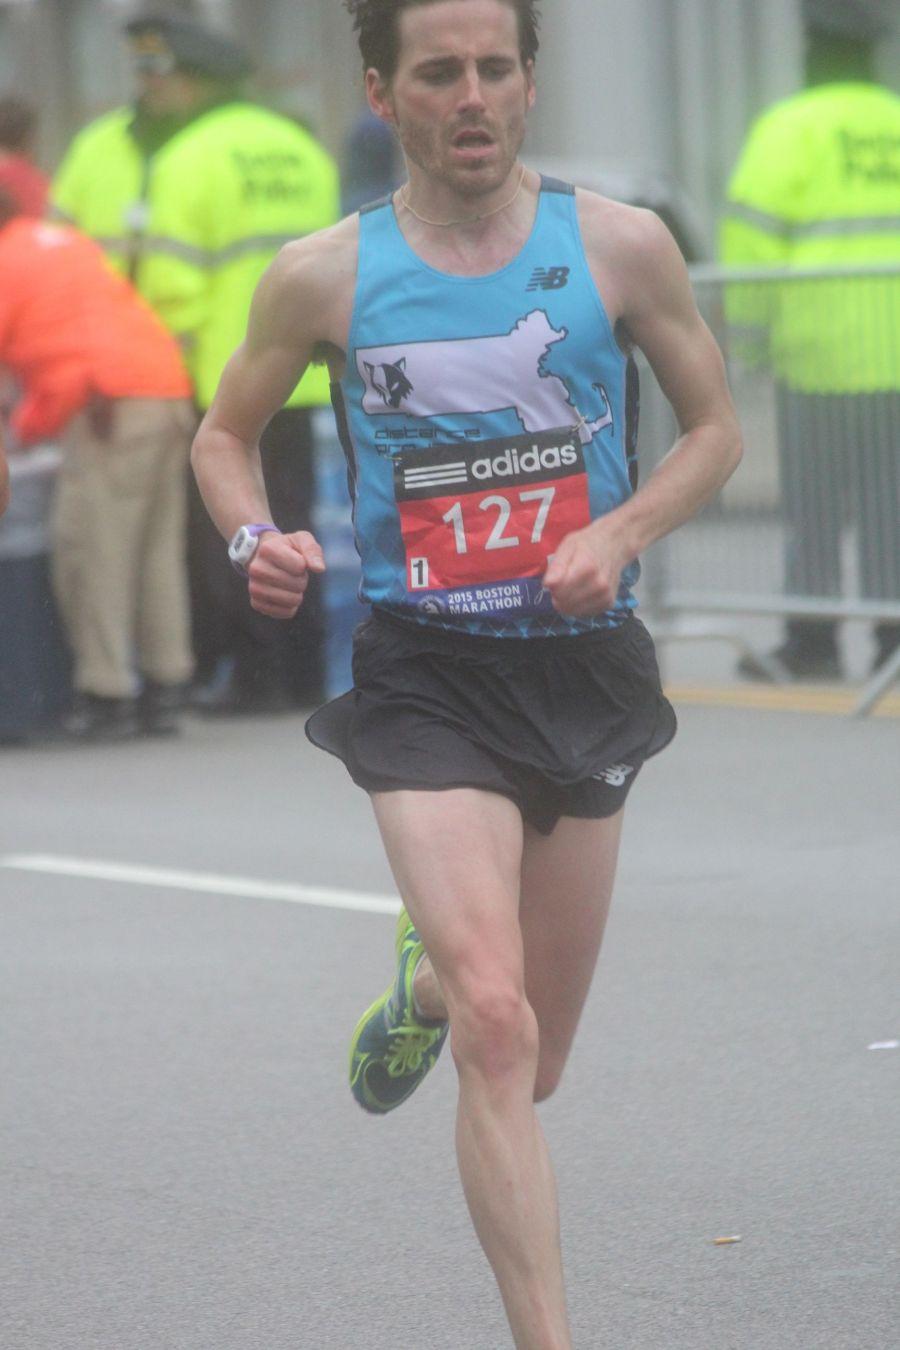 boston marathon april 20 2015 racer number 127